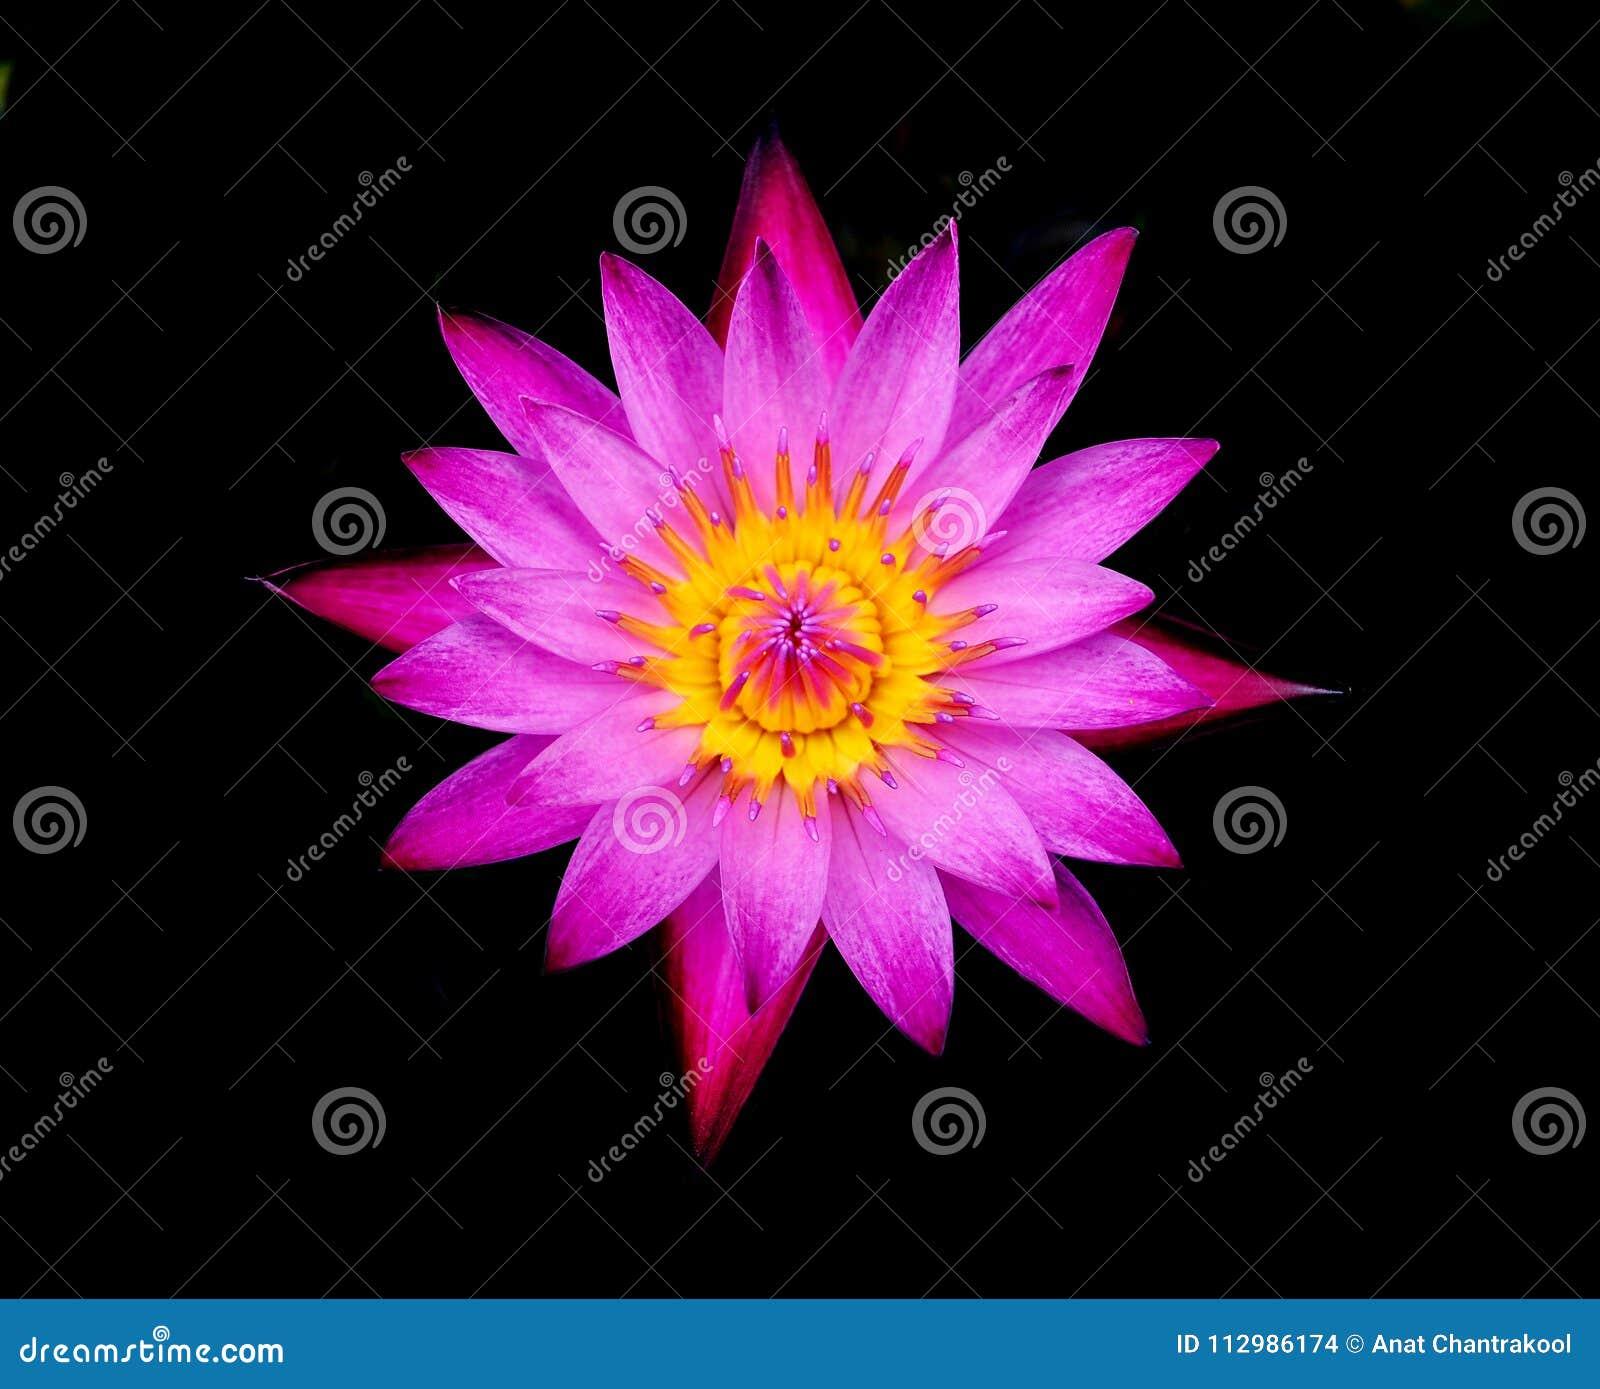 Single lotus flower isolated on black background